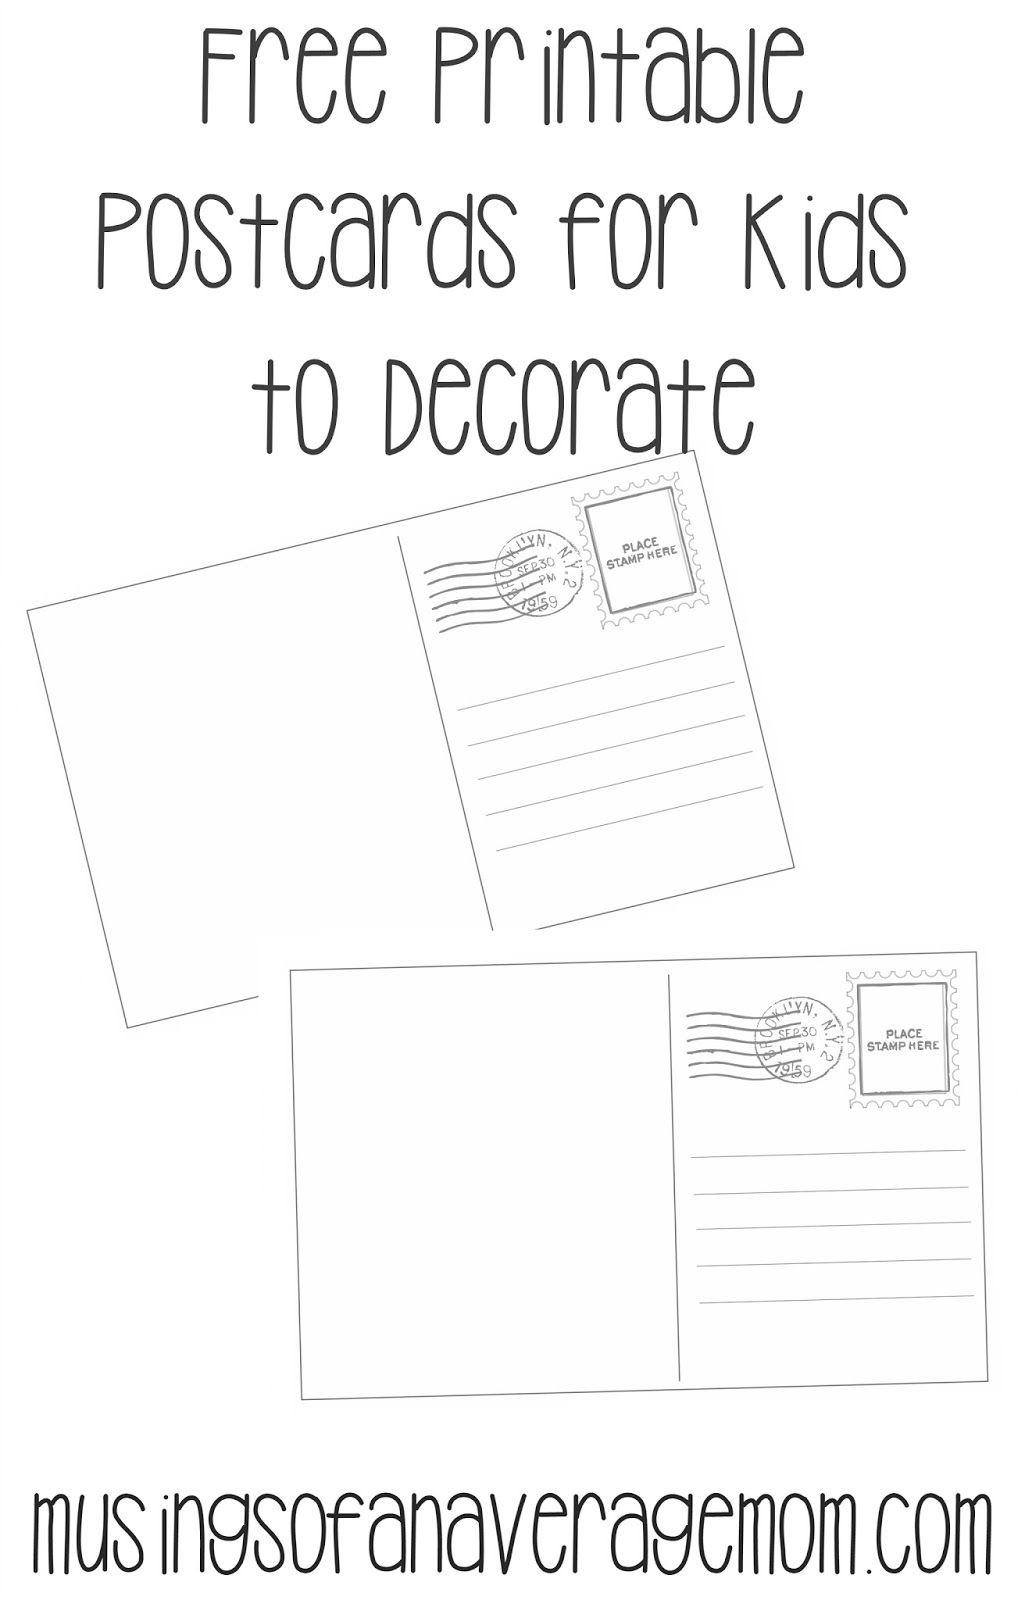 Postcard Templates   Printable Worksheets   Printable Postcards - Free Printable Postcards